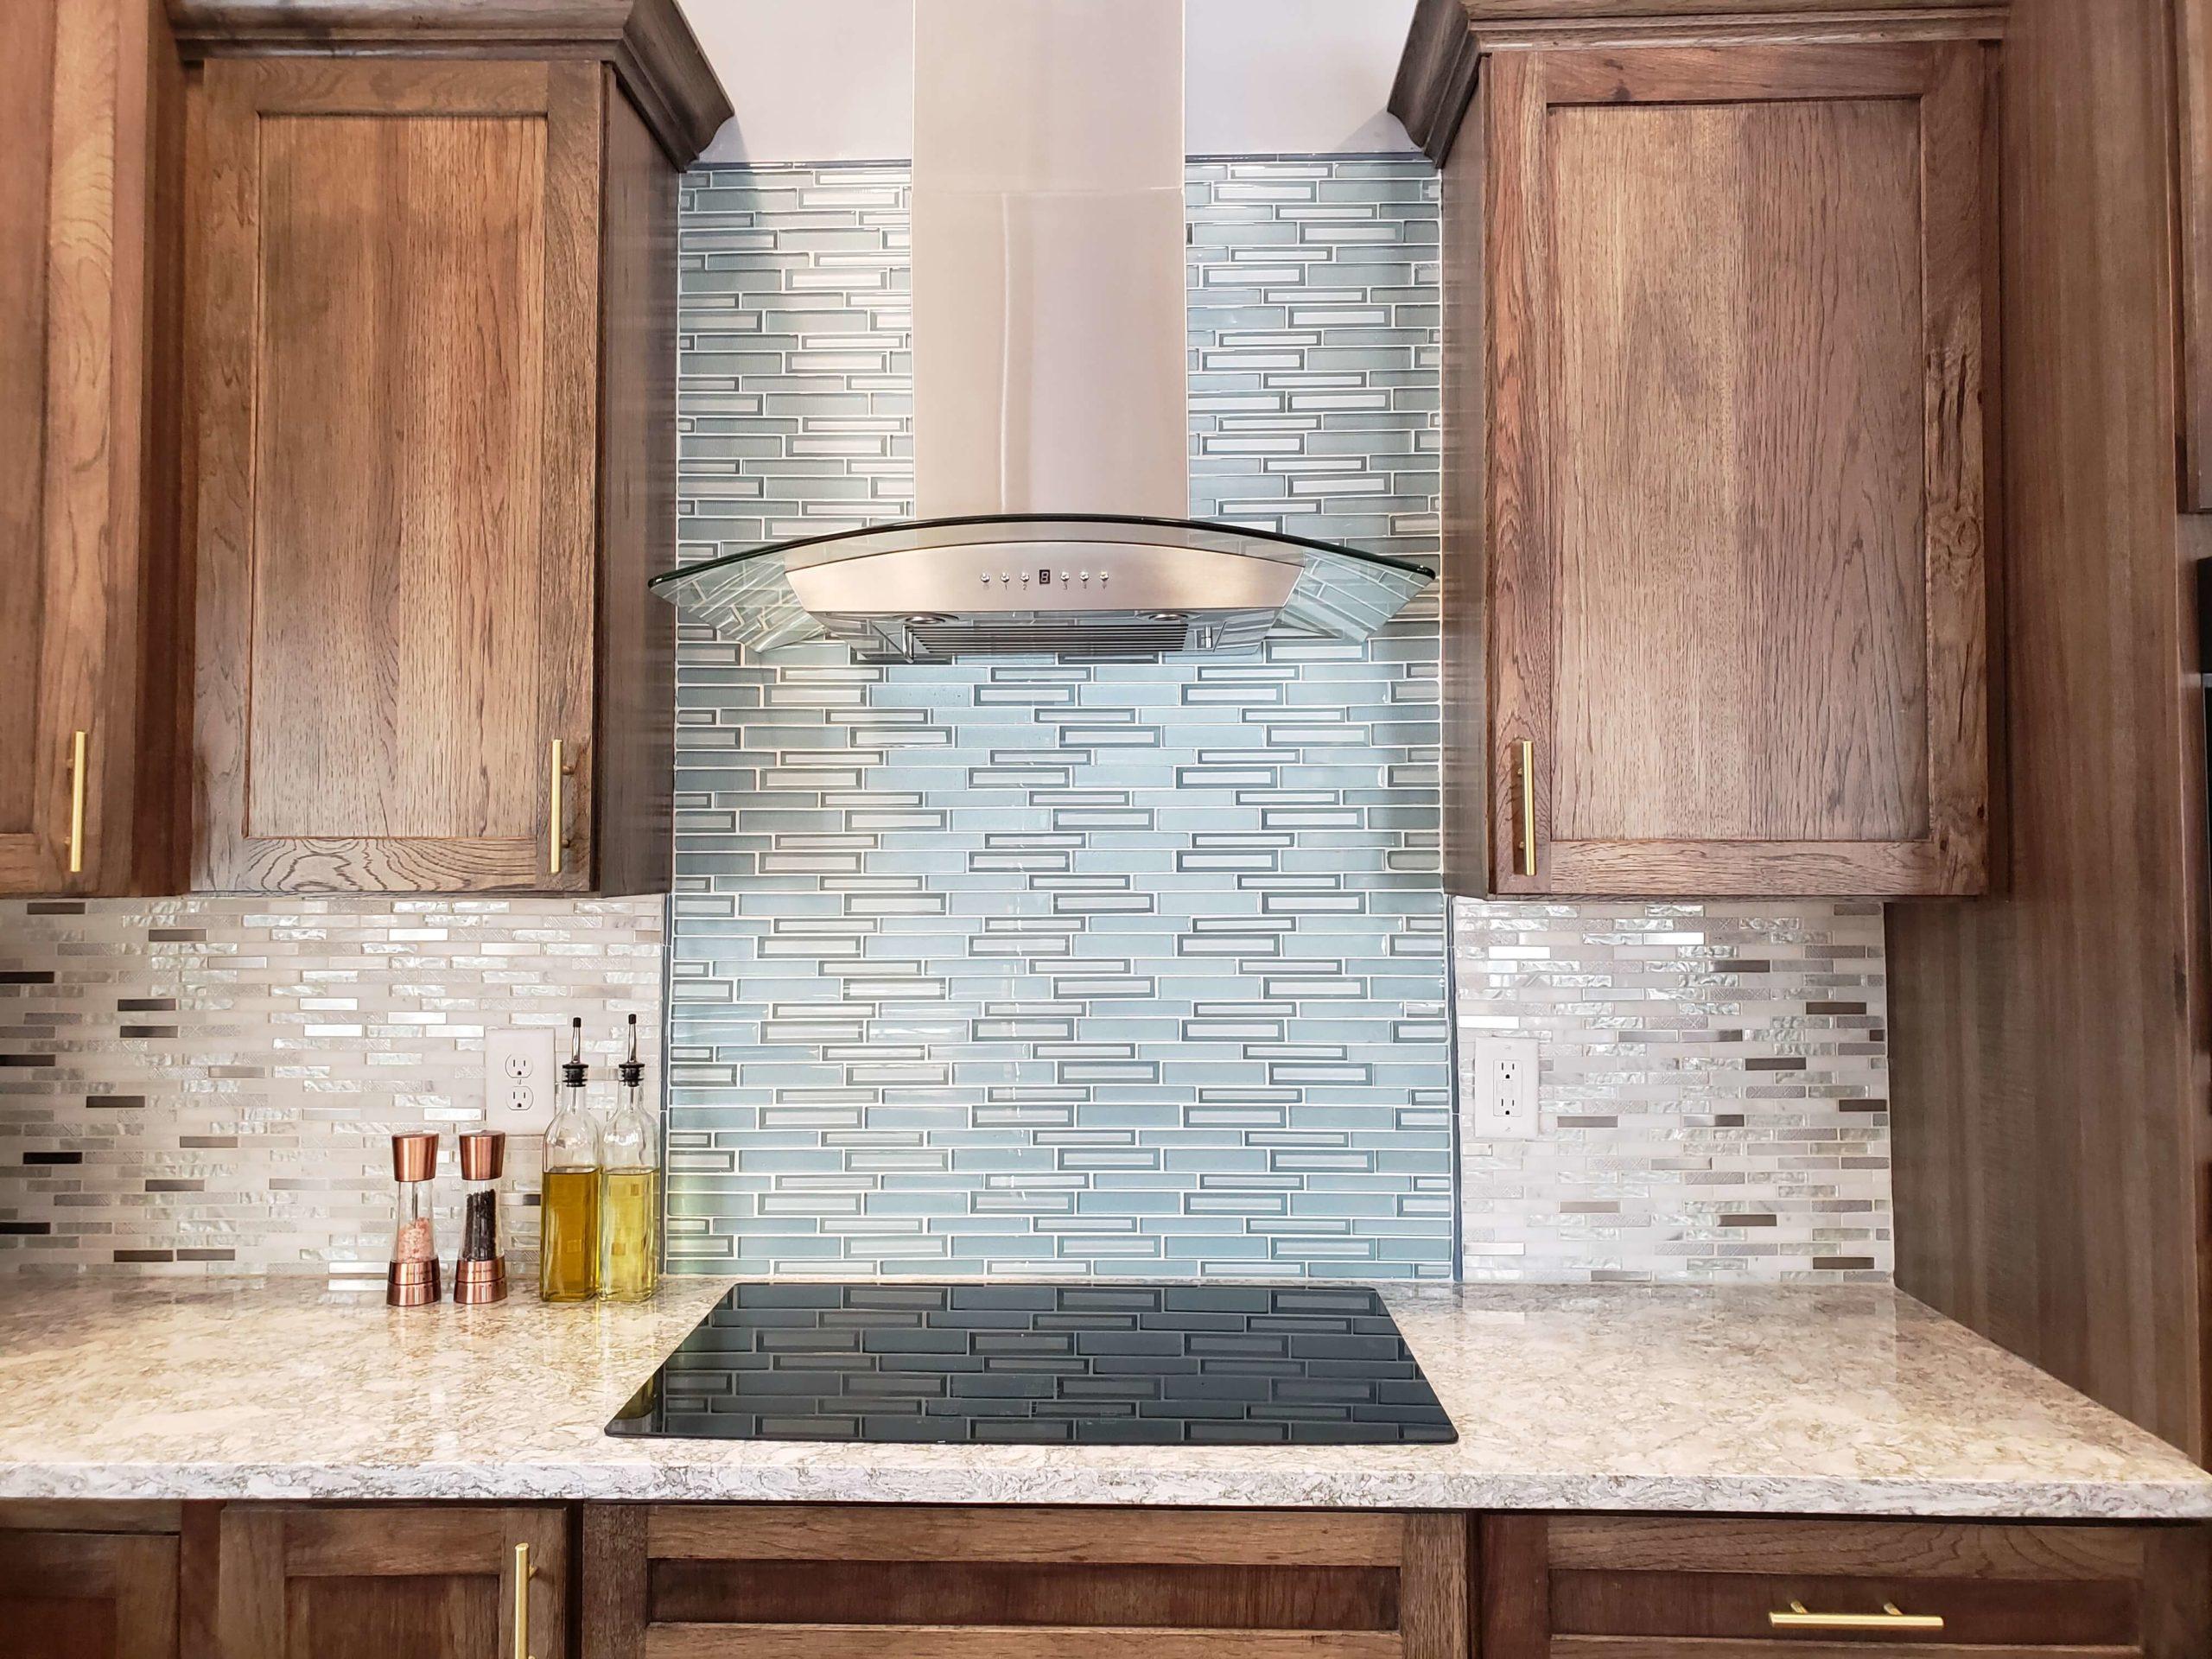 Hickory Oak Cabinets Inspiration Gallery Kitchen Express